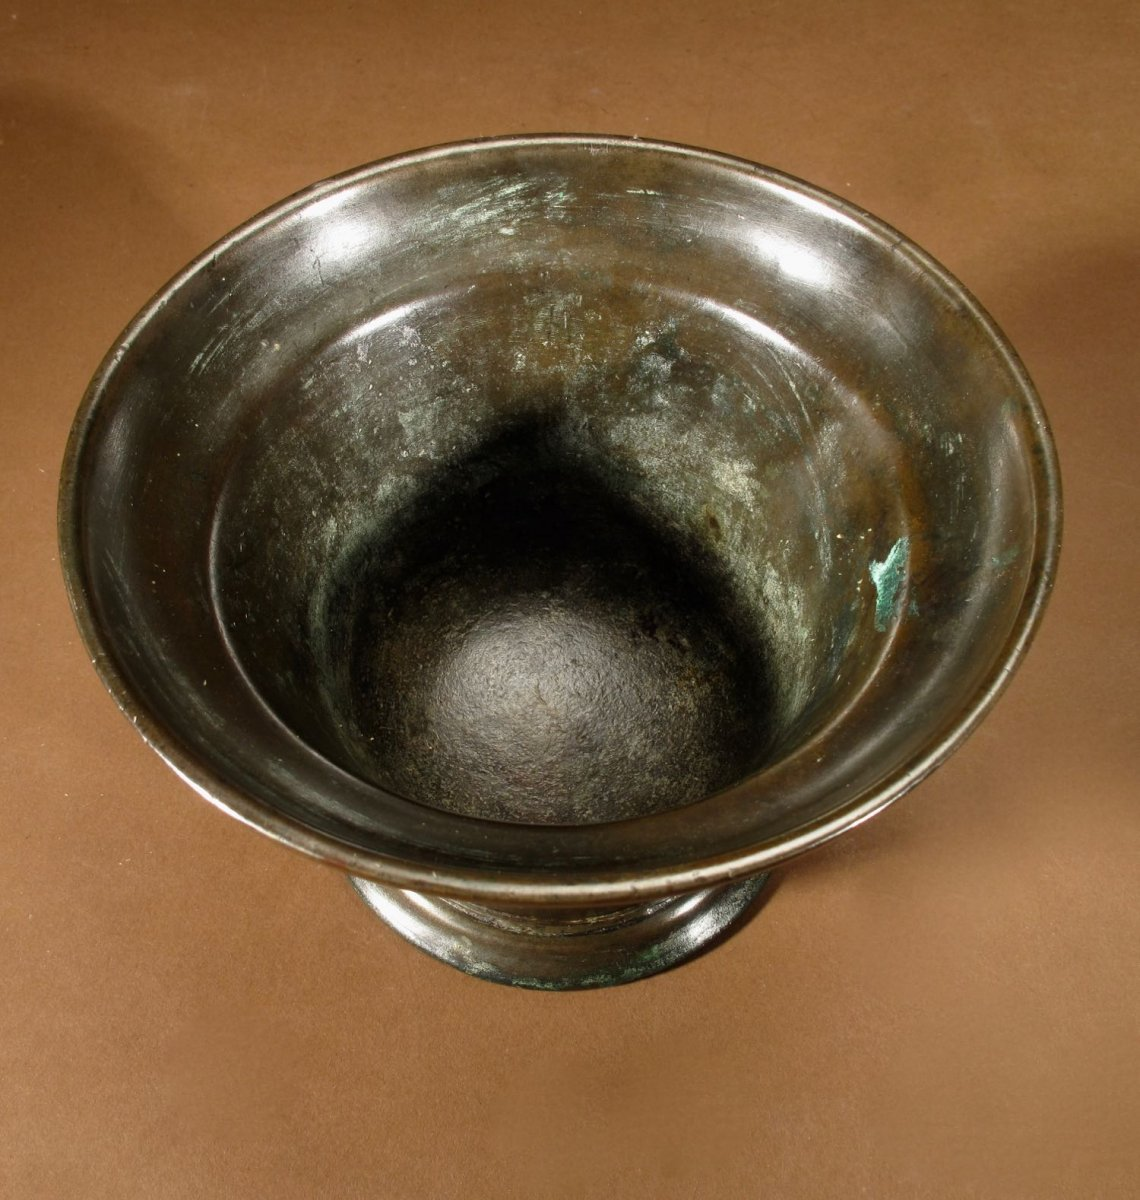 Un Beau Mortier En Bronze Uni, Continental, XVIIe / XVIIIe Siècle-photo-2